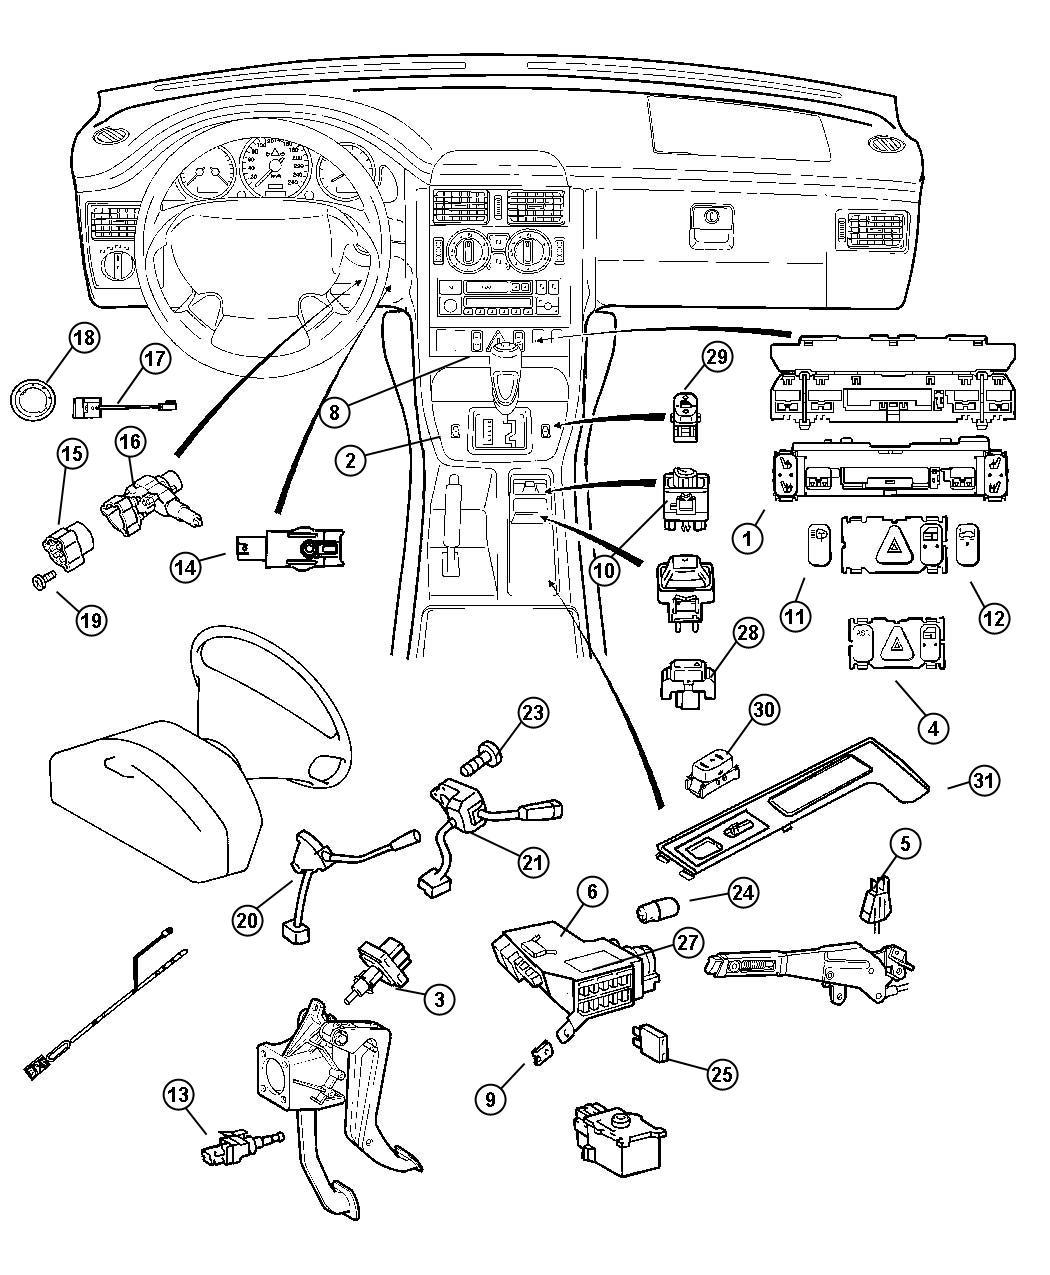 68001655aa dodge housing ignition switch mopar parts. Black Bedroom Furniture Sets. Home Design Ideas